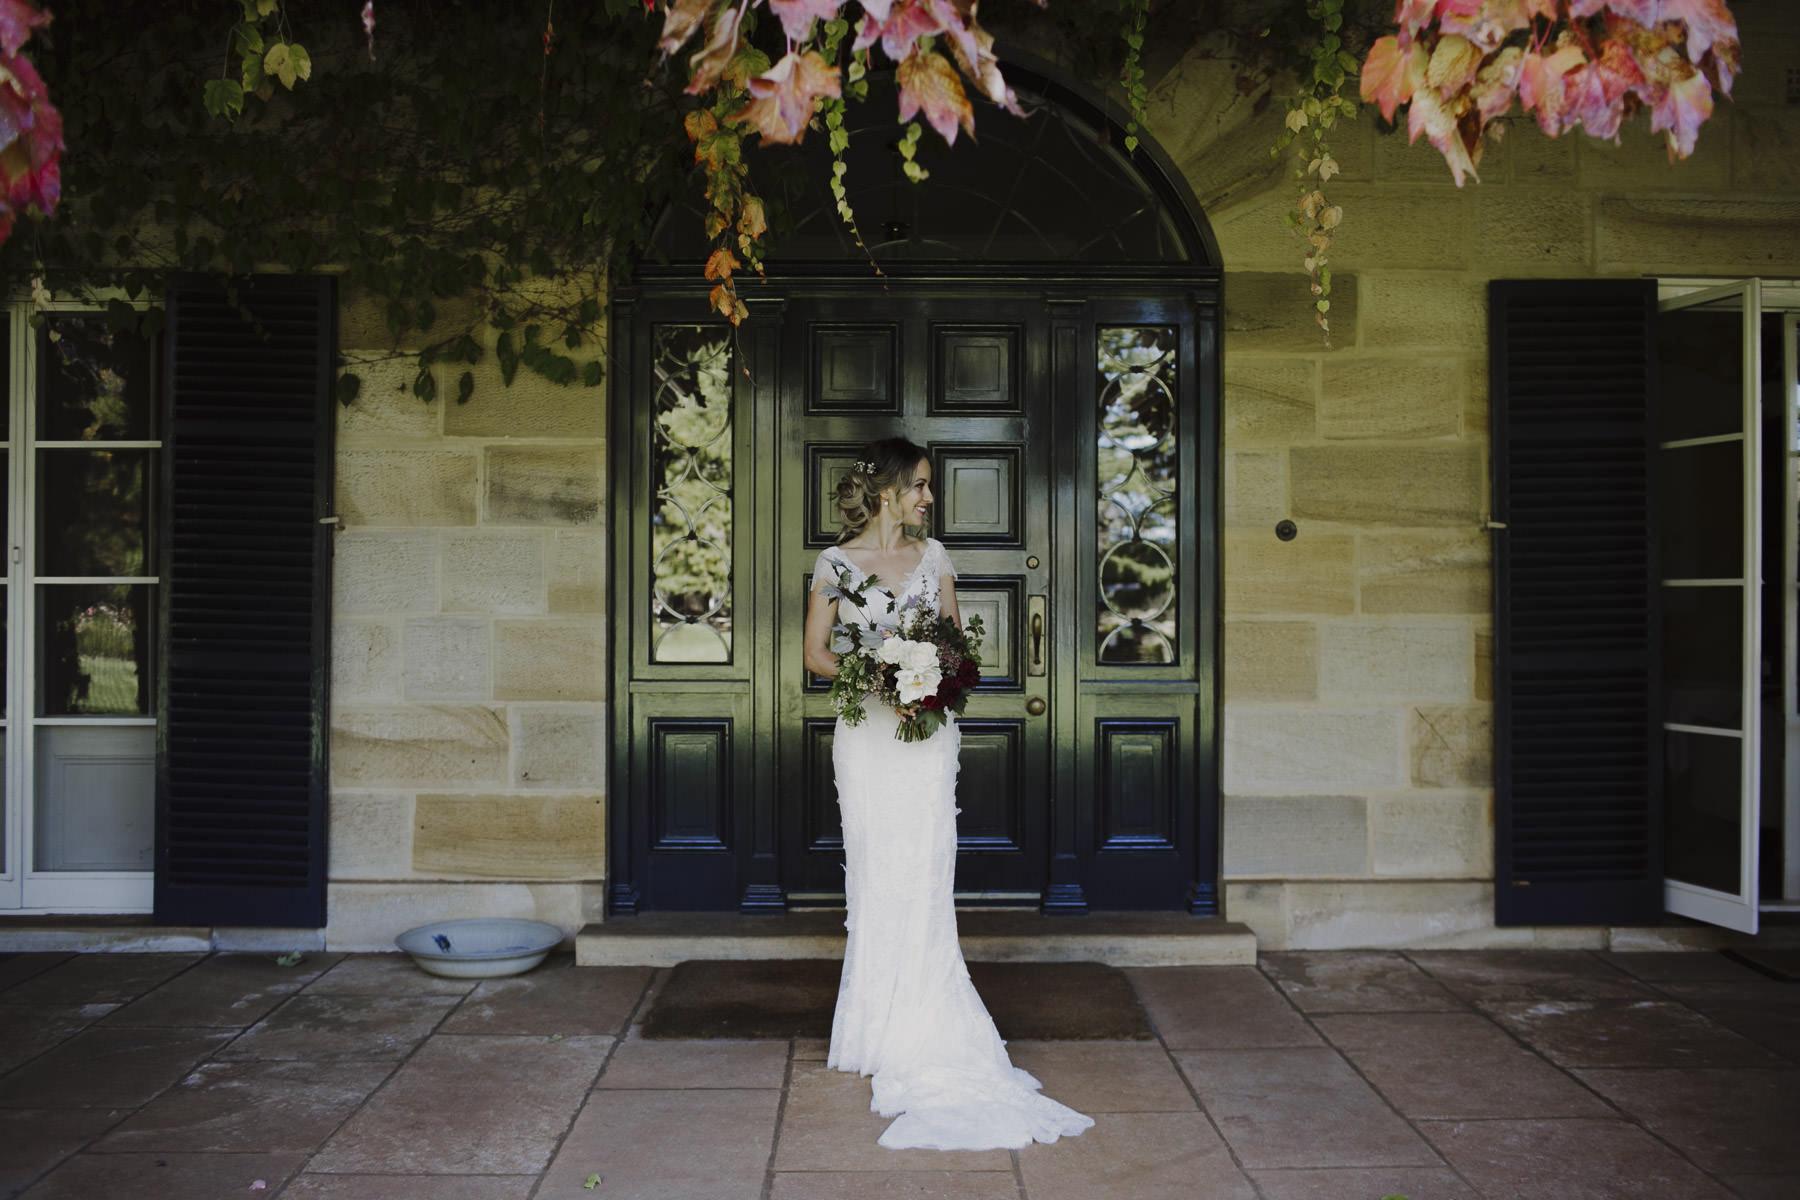 160506_justinaaron_wedding_holly_daniel_pr-50.jpg